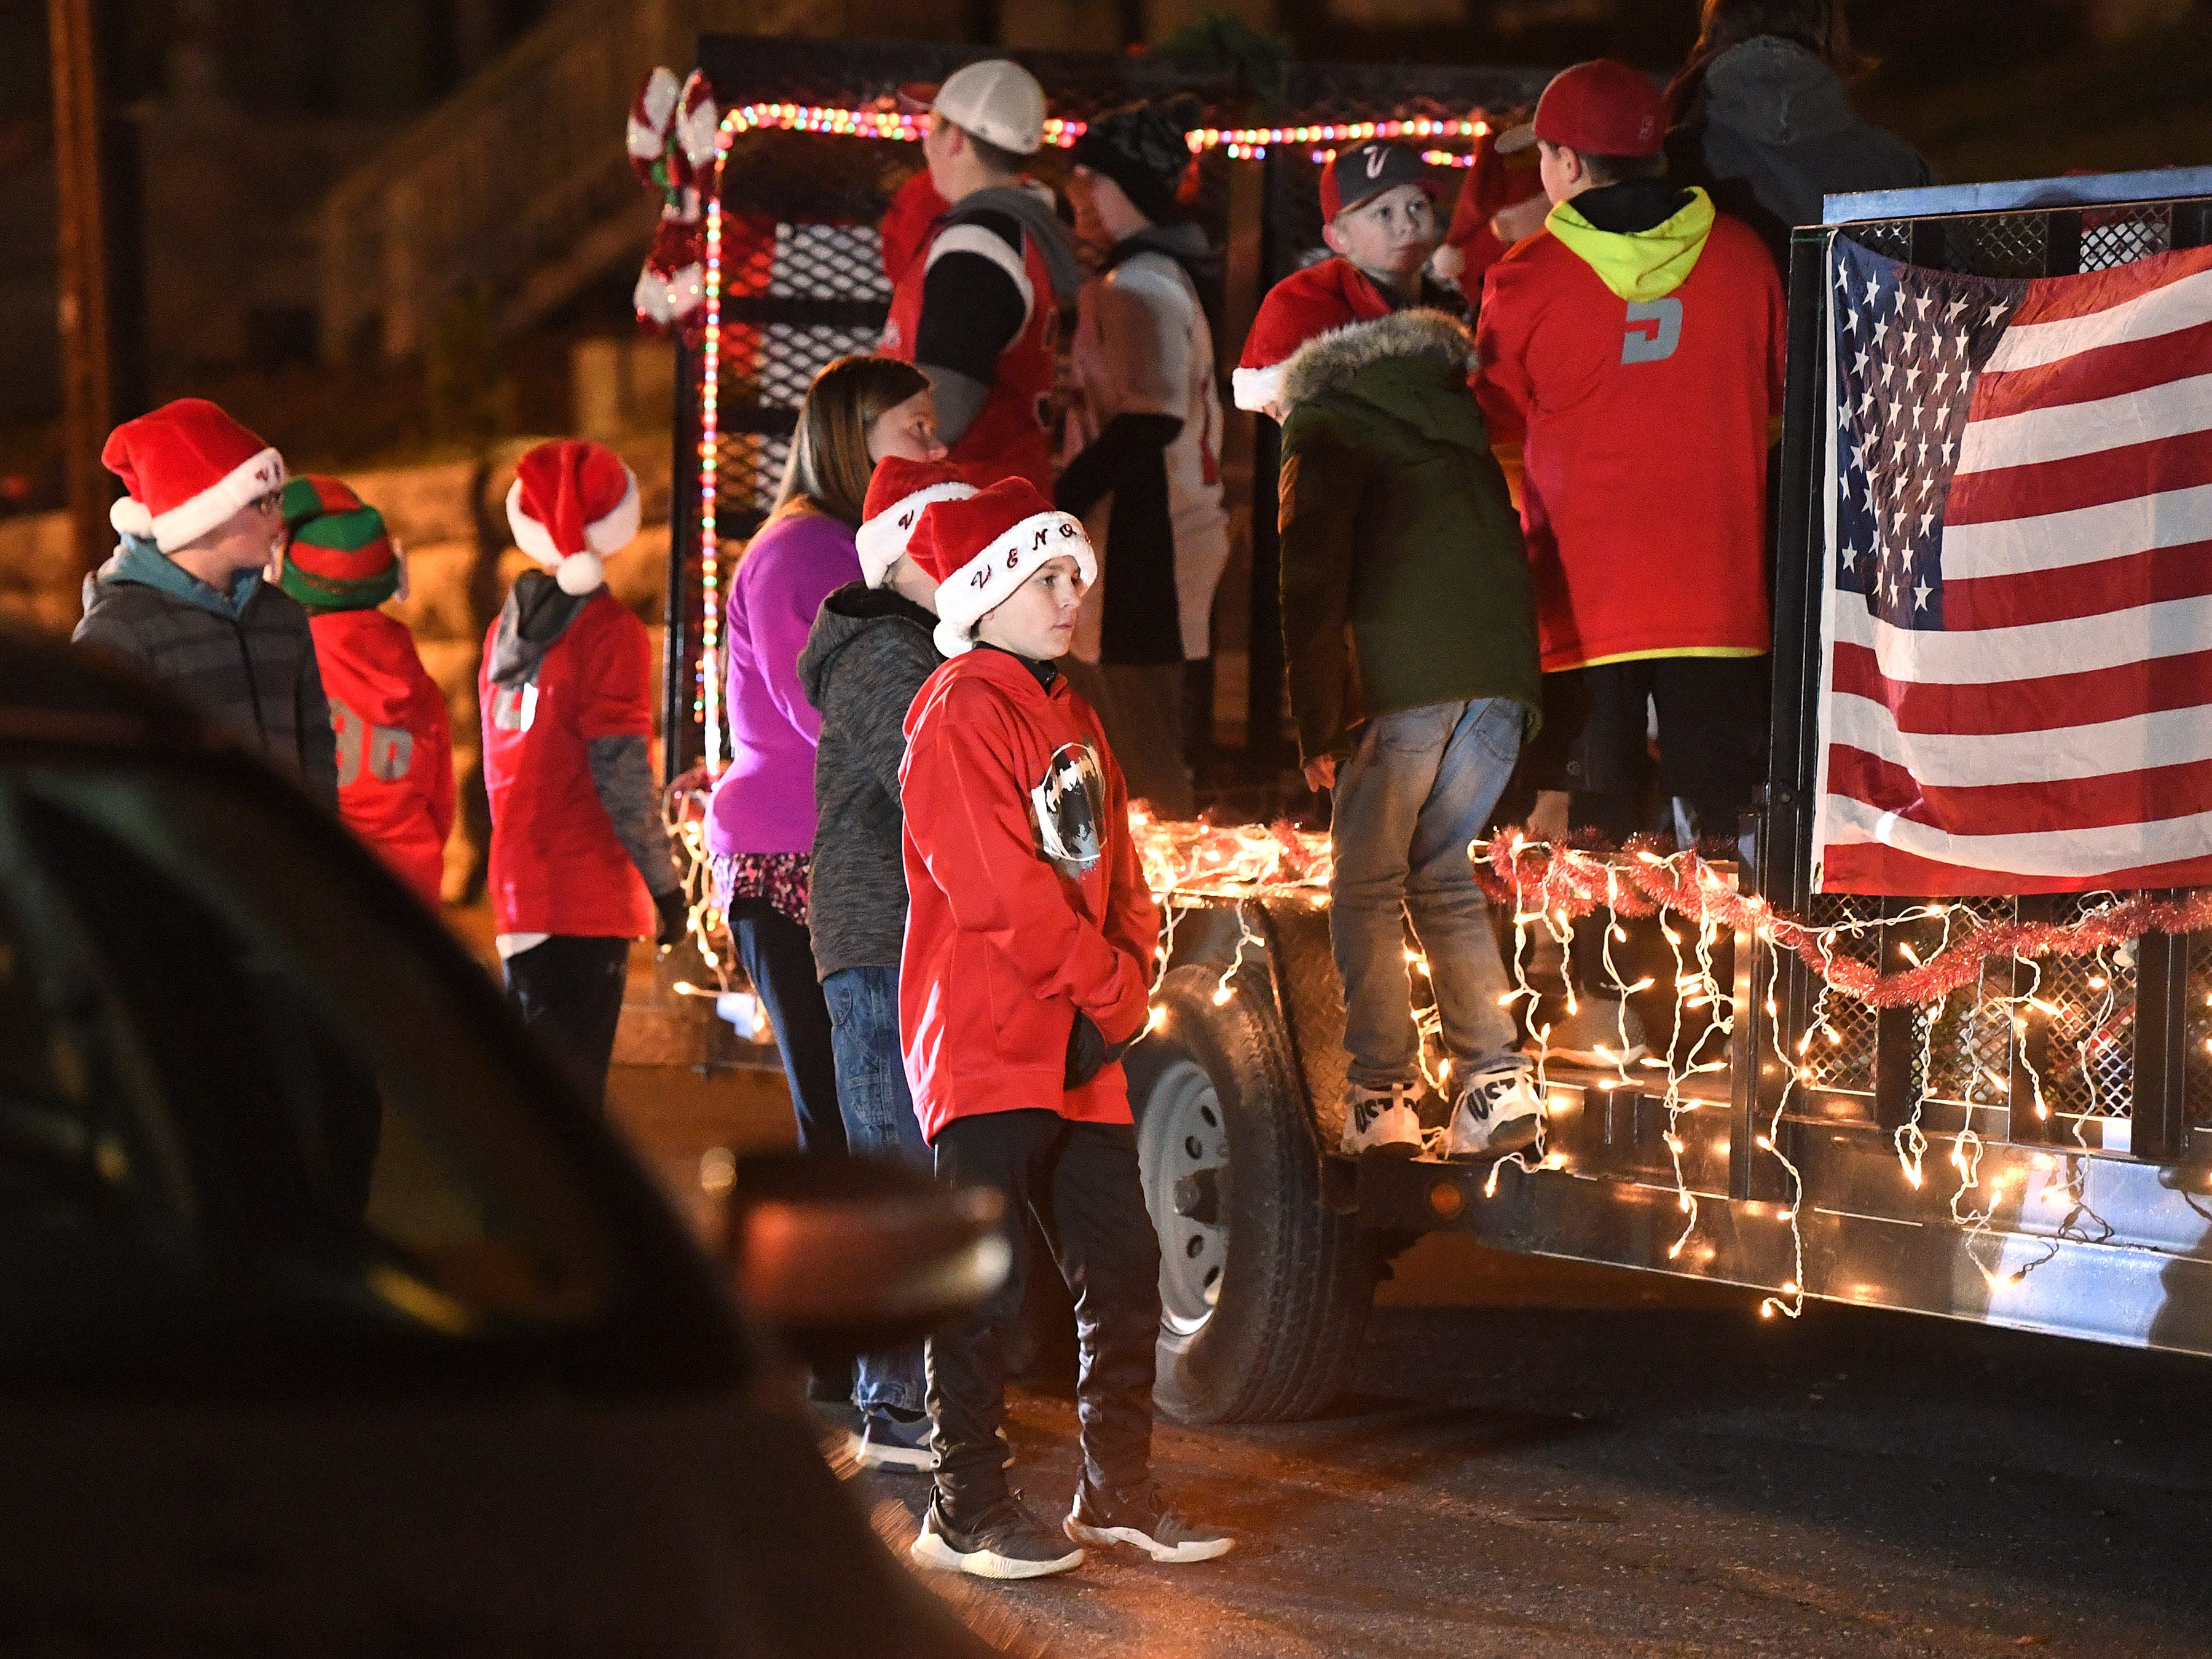 Parade participants wait for the Staunton Christmas Parade to begin on Monday, Nov. 26, 2018.